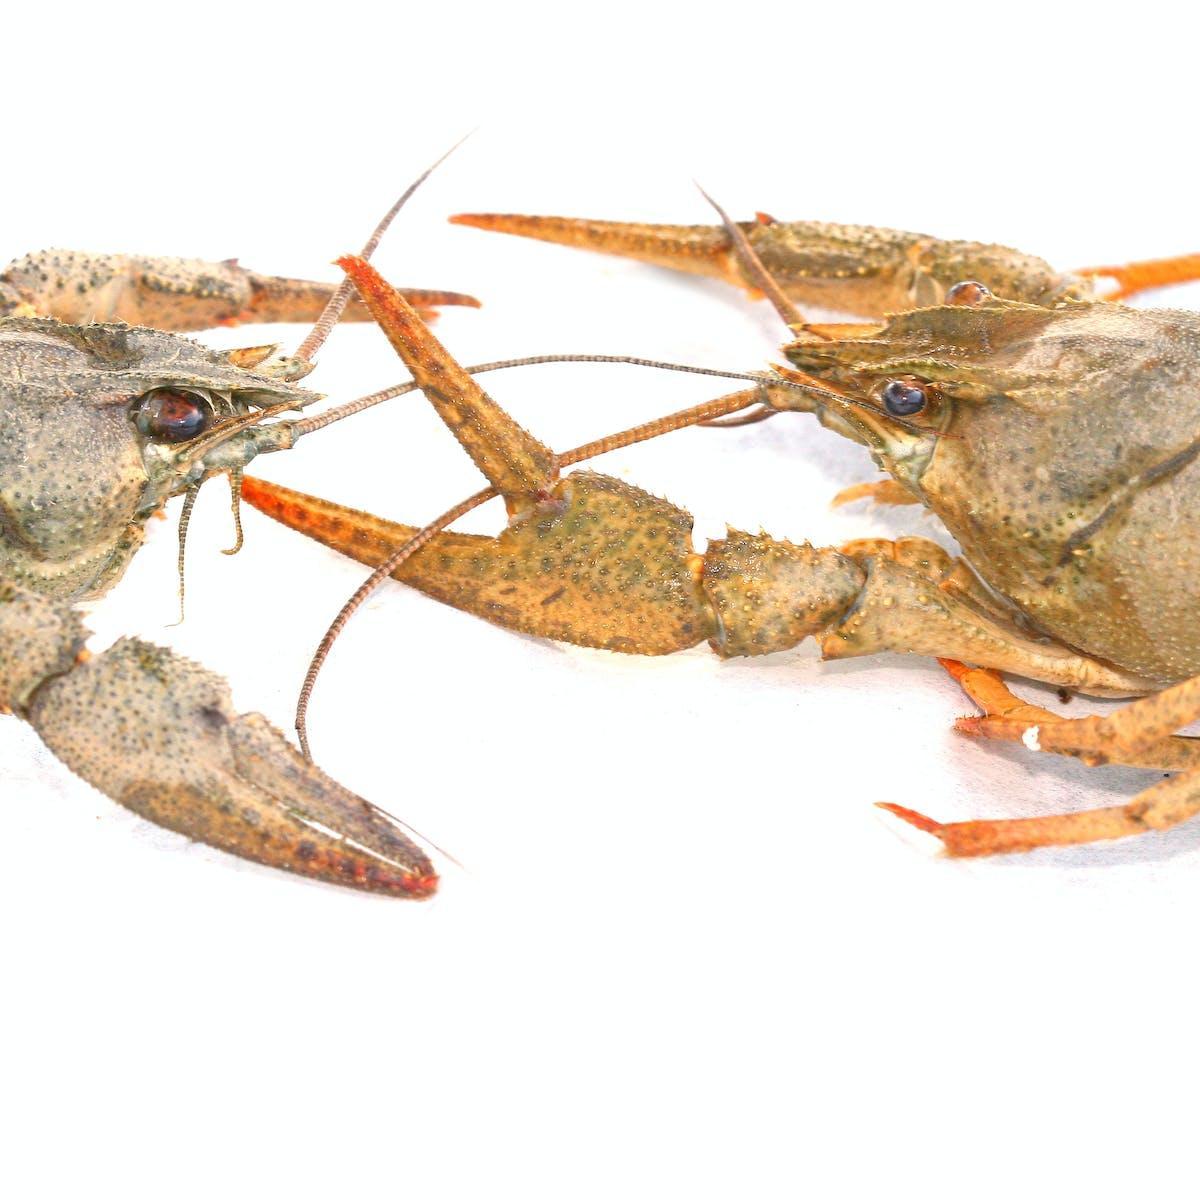 Psychologist Jordan Peterson says lobsters help to explain